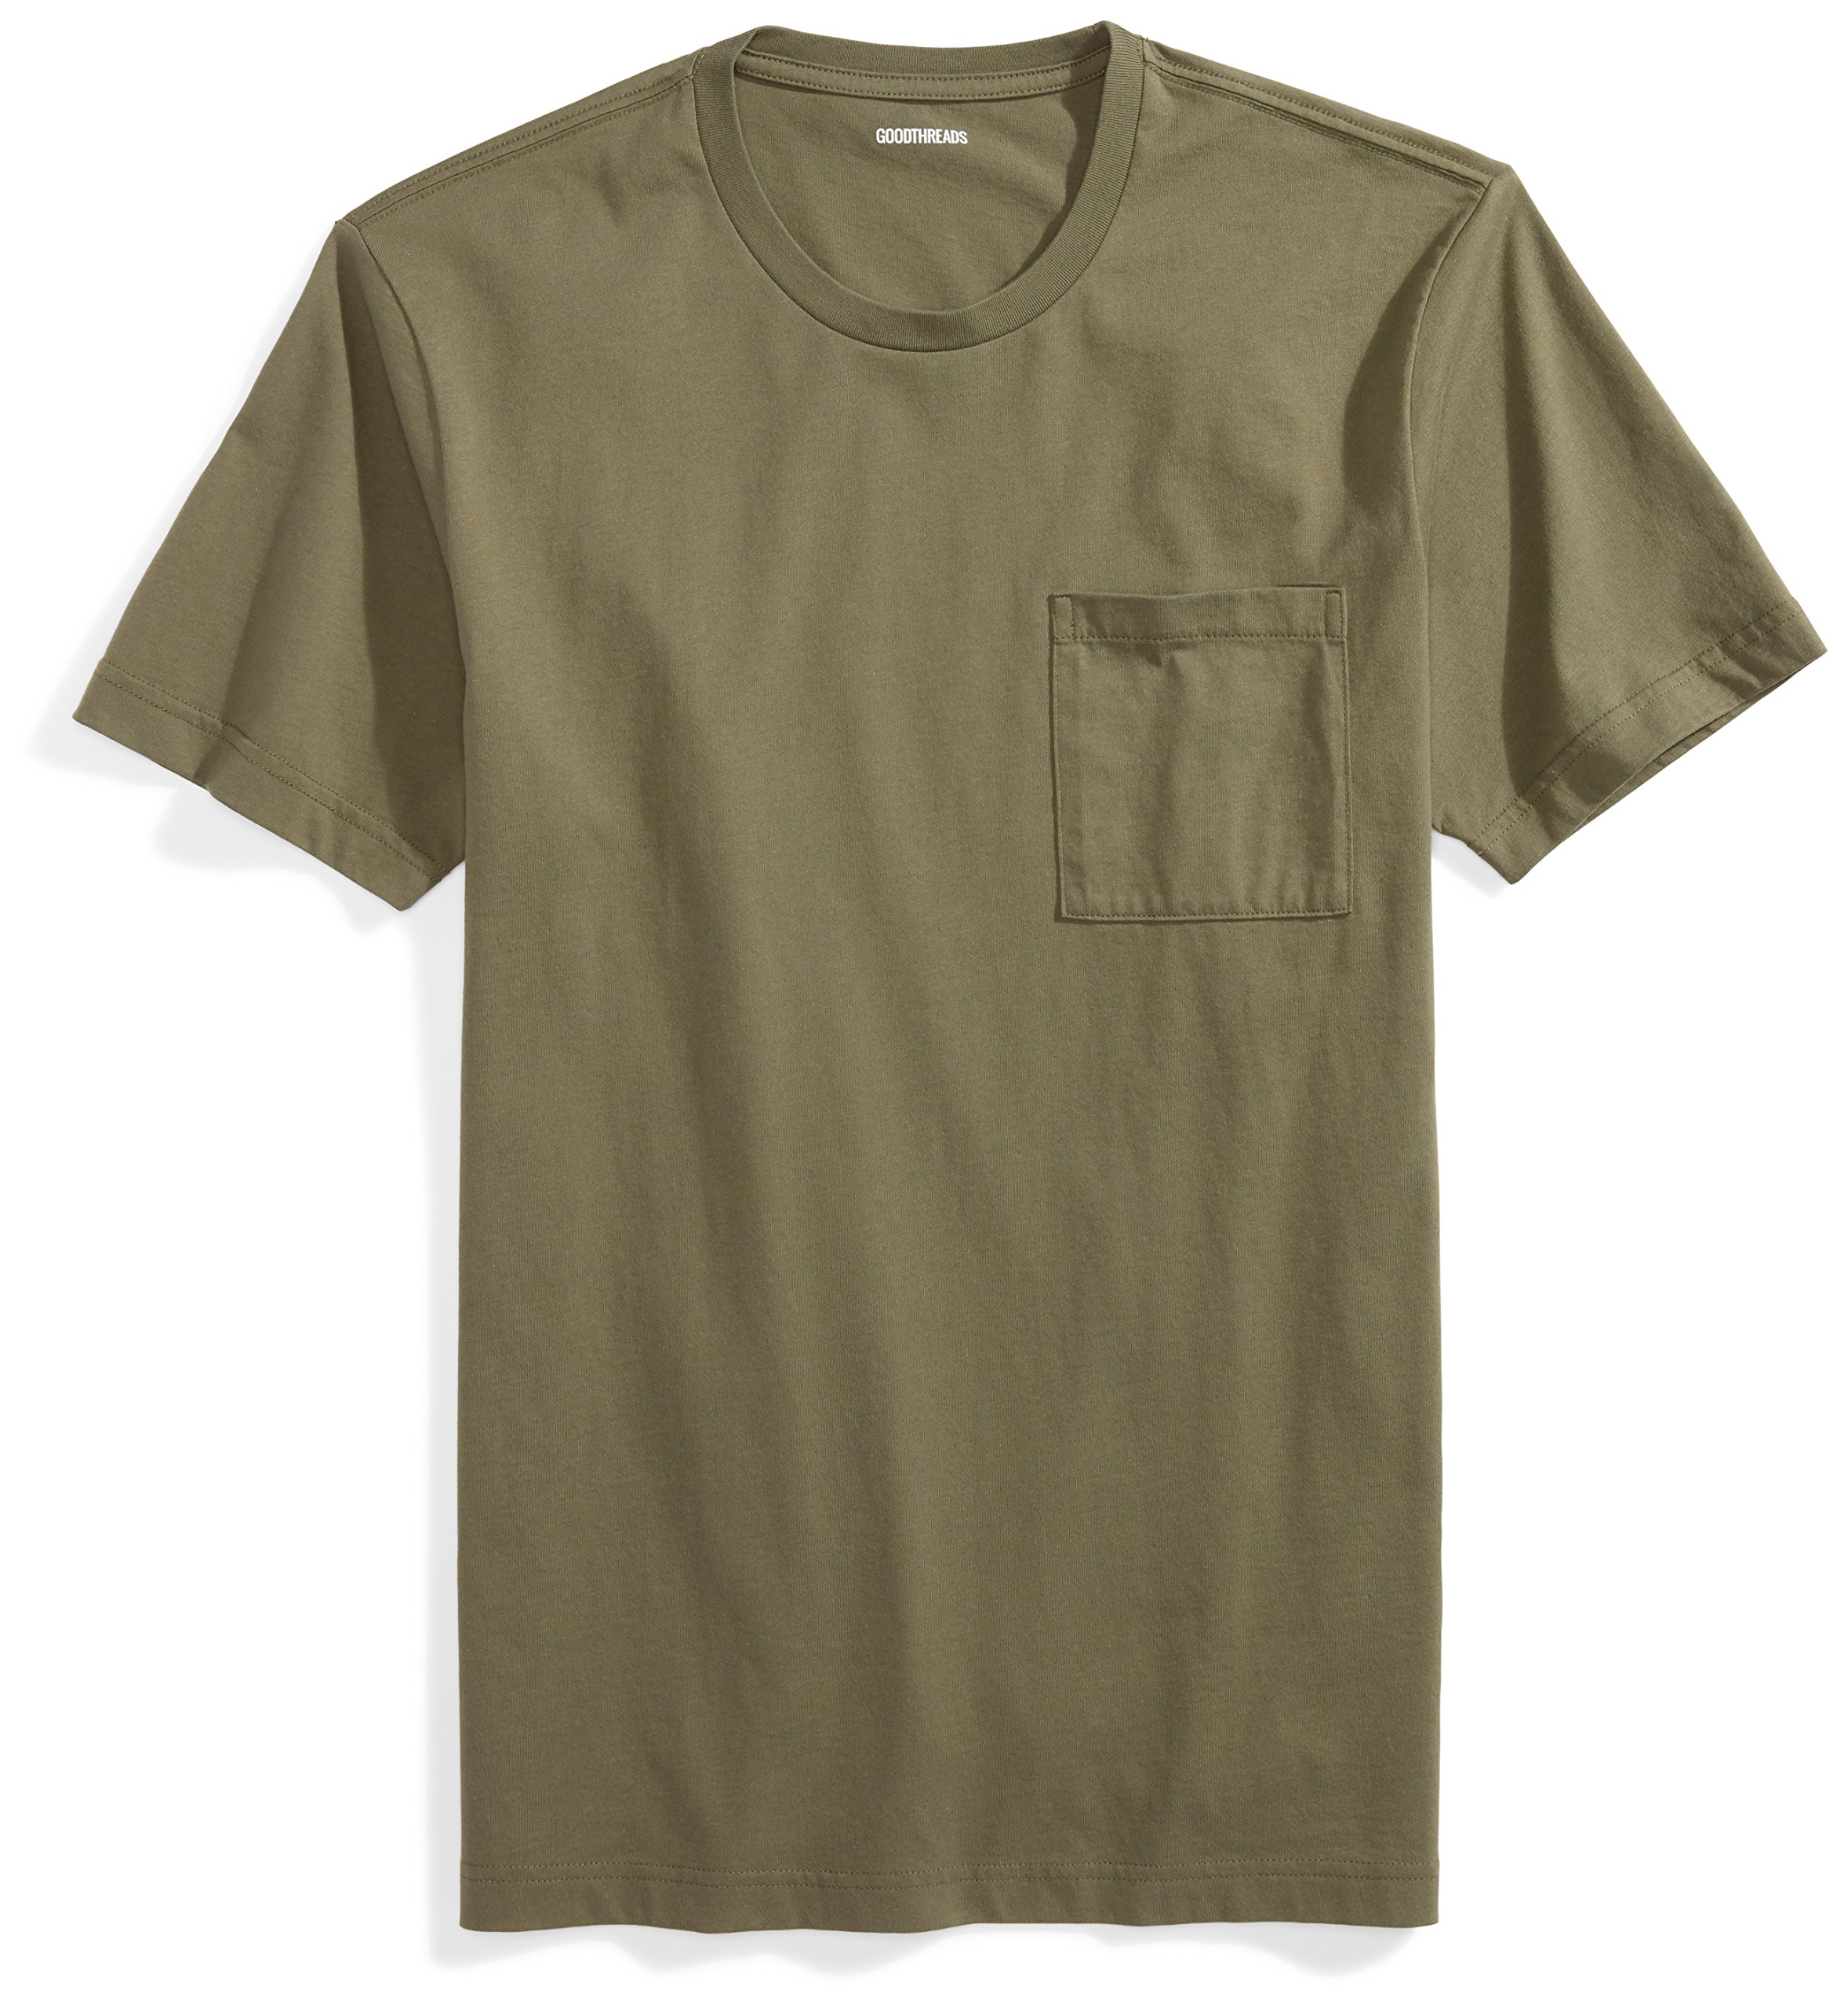 Goodthreads Men's Short-Sleeve Crewneck Cotton T-Shirt, Olive, X-Large